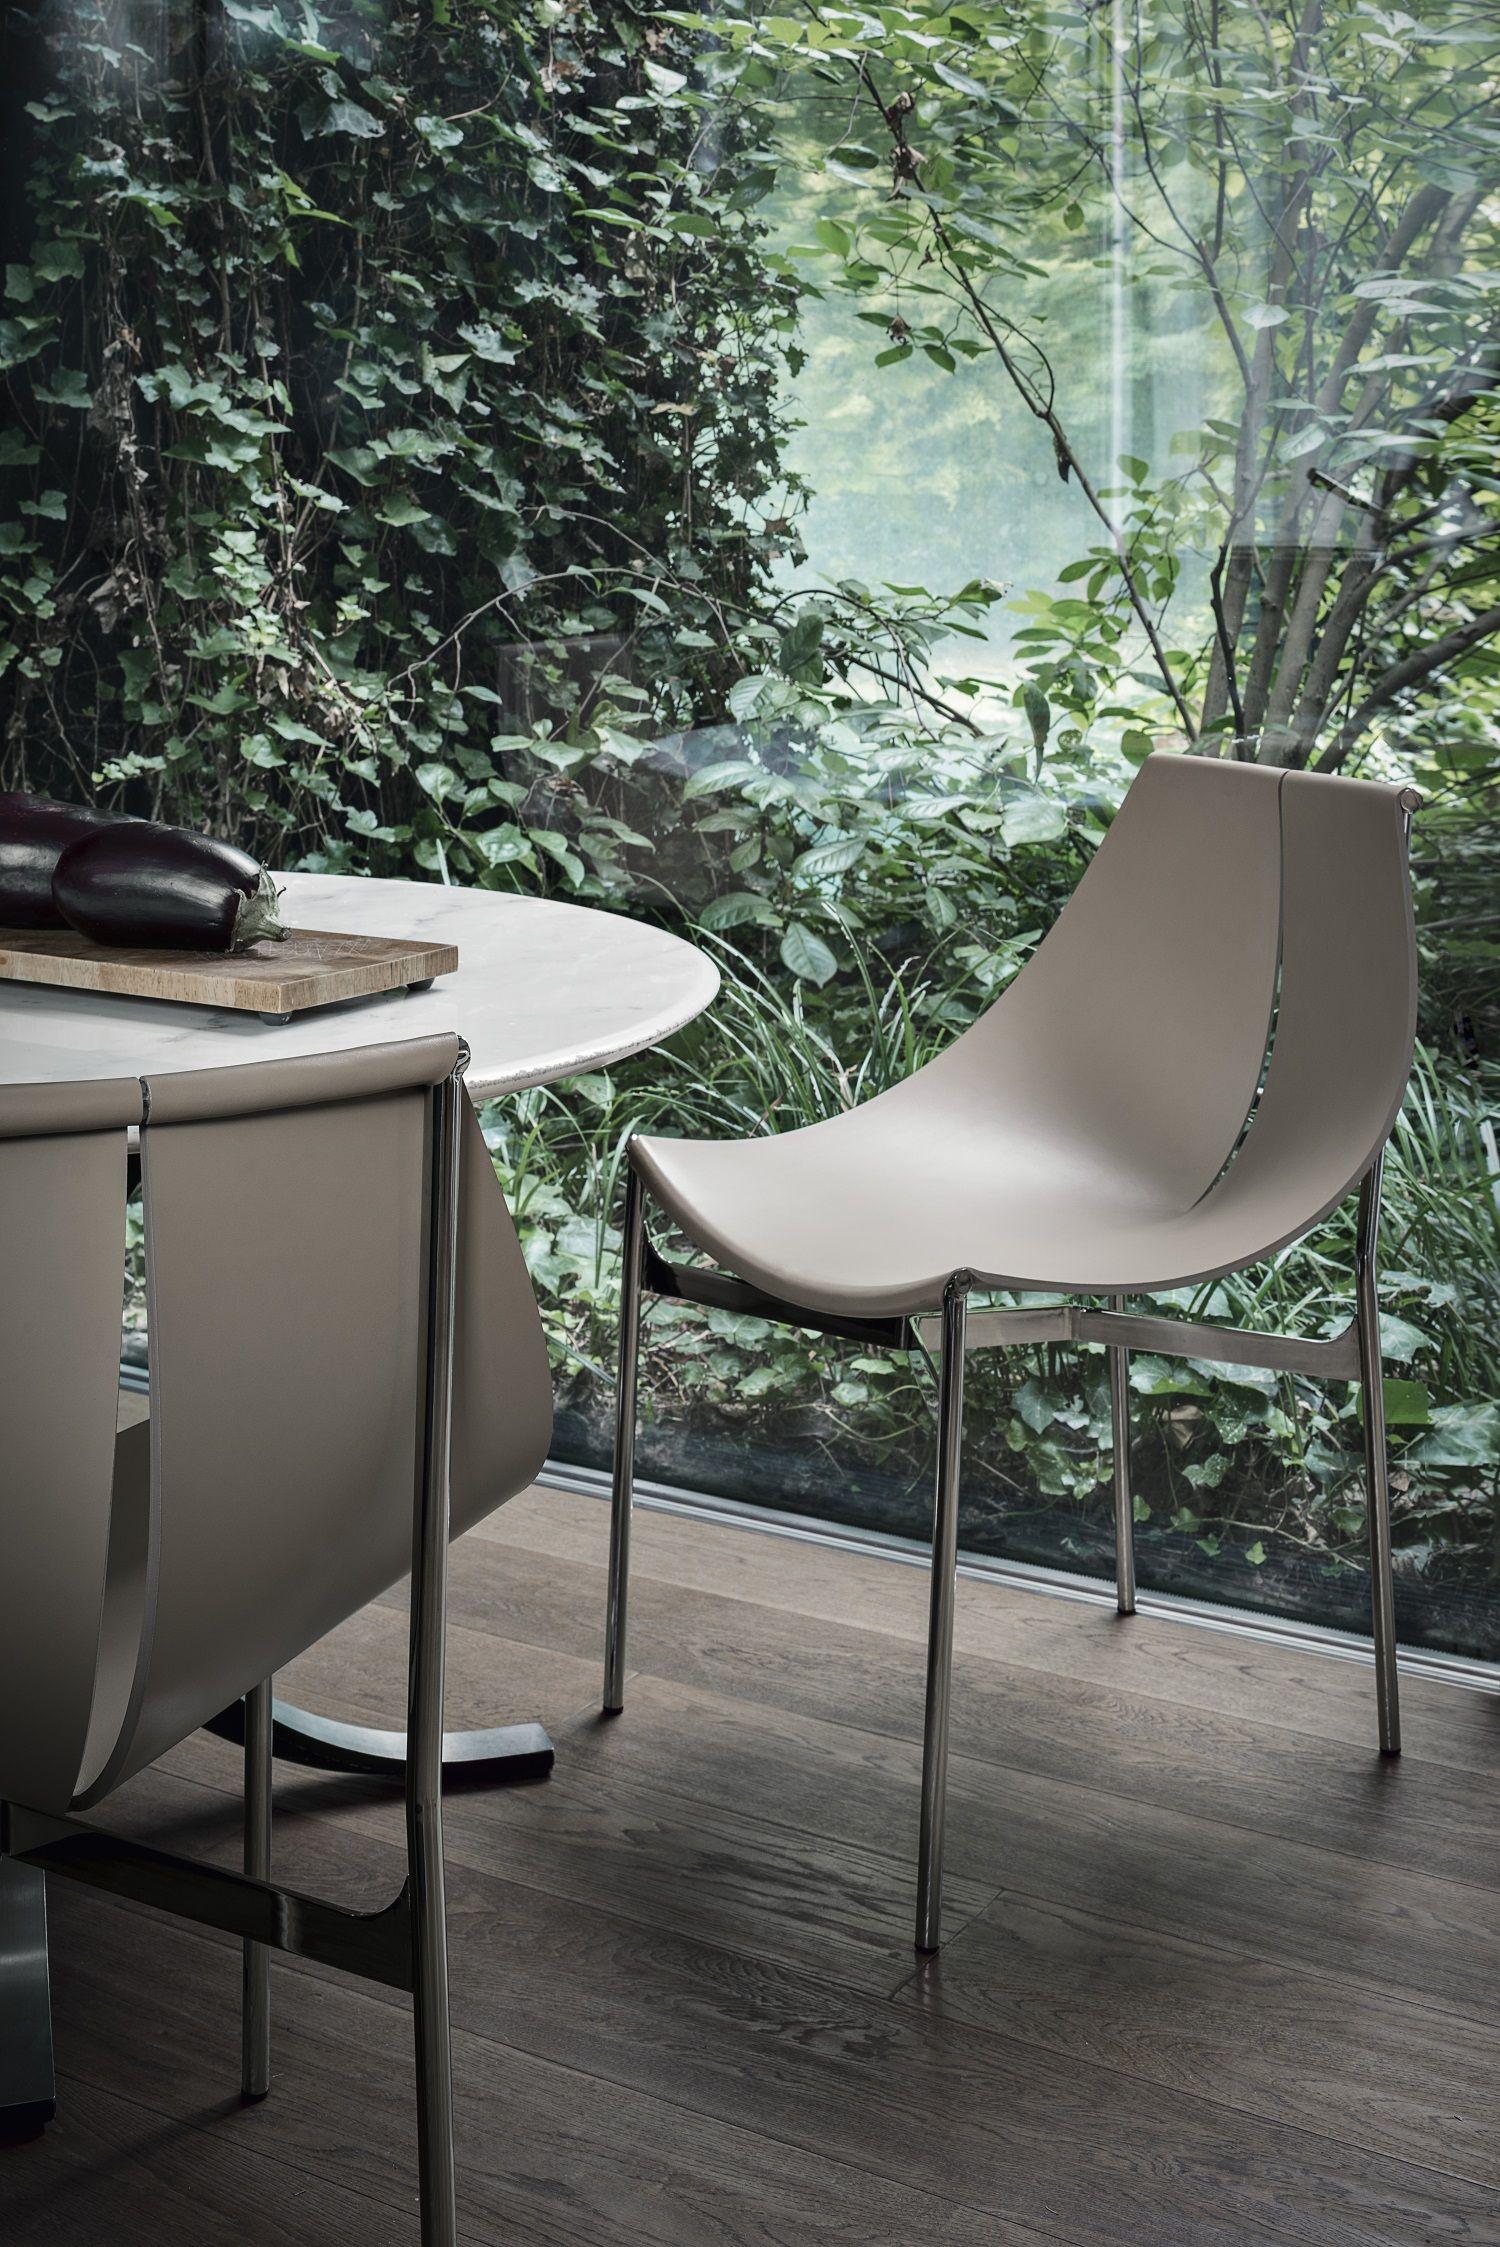 75da0020b62858a88a1751a1e4129054 Impressionnant De Table Transformable Concept